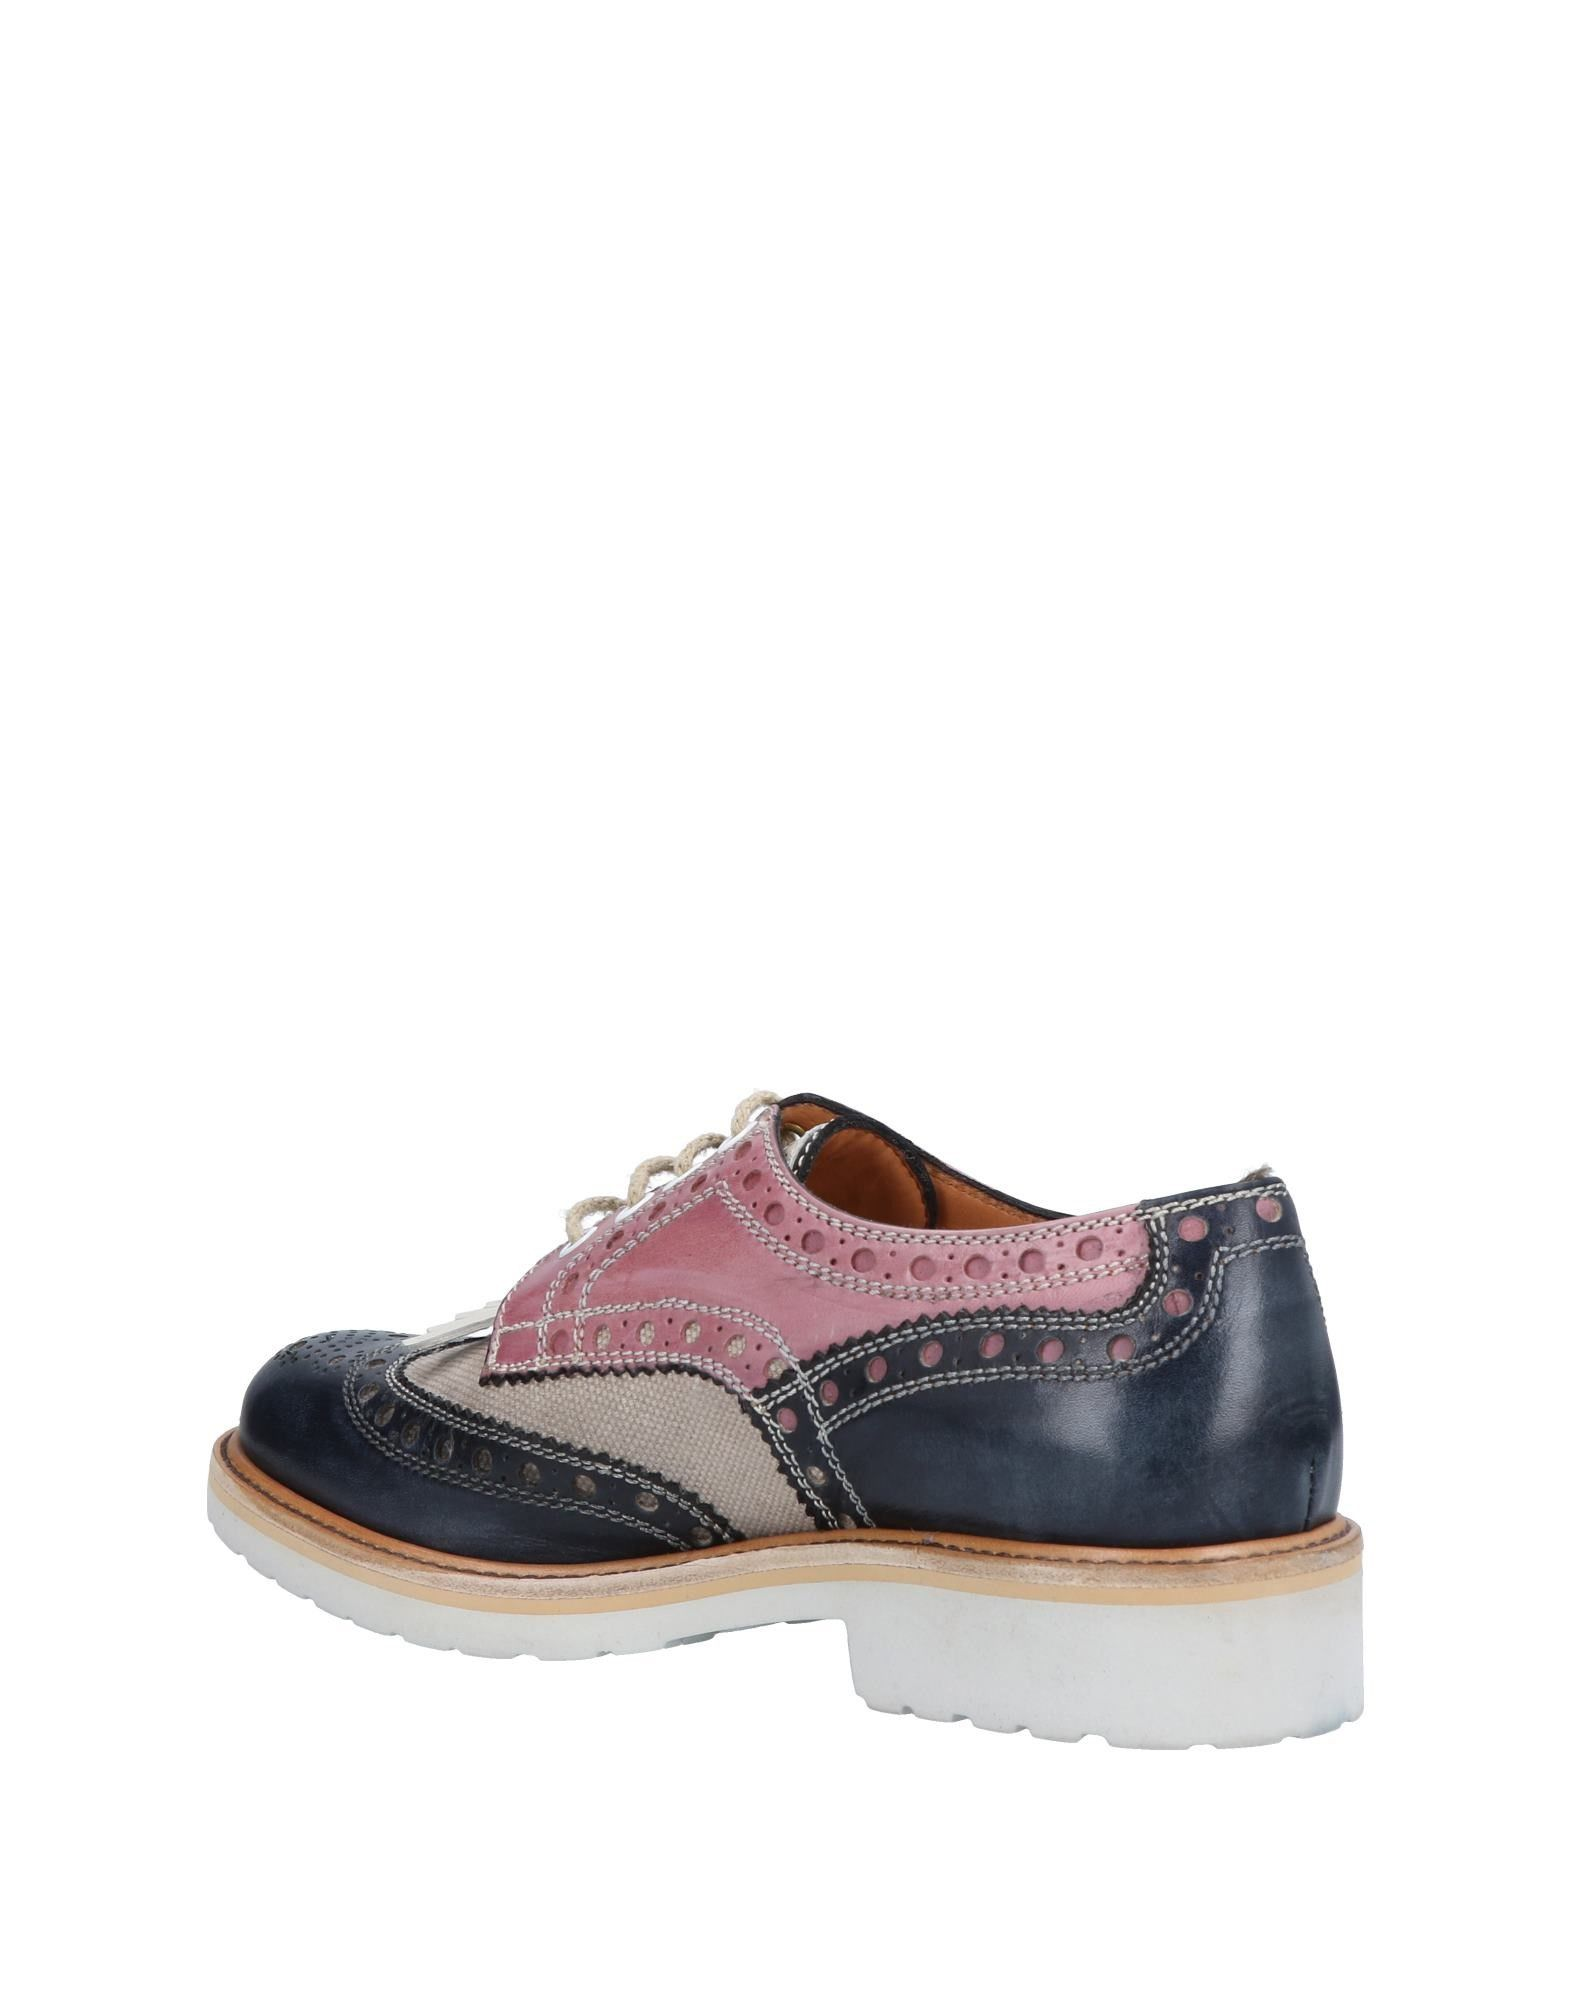 Stilvolle Damen billige Schuhe Botti Schnürschuhe Damen Stilvolle  11464393TX e6f9da